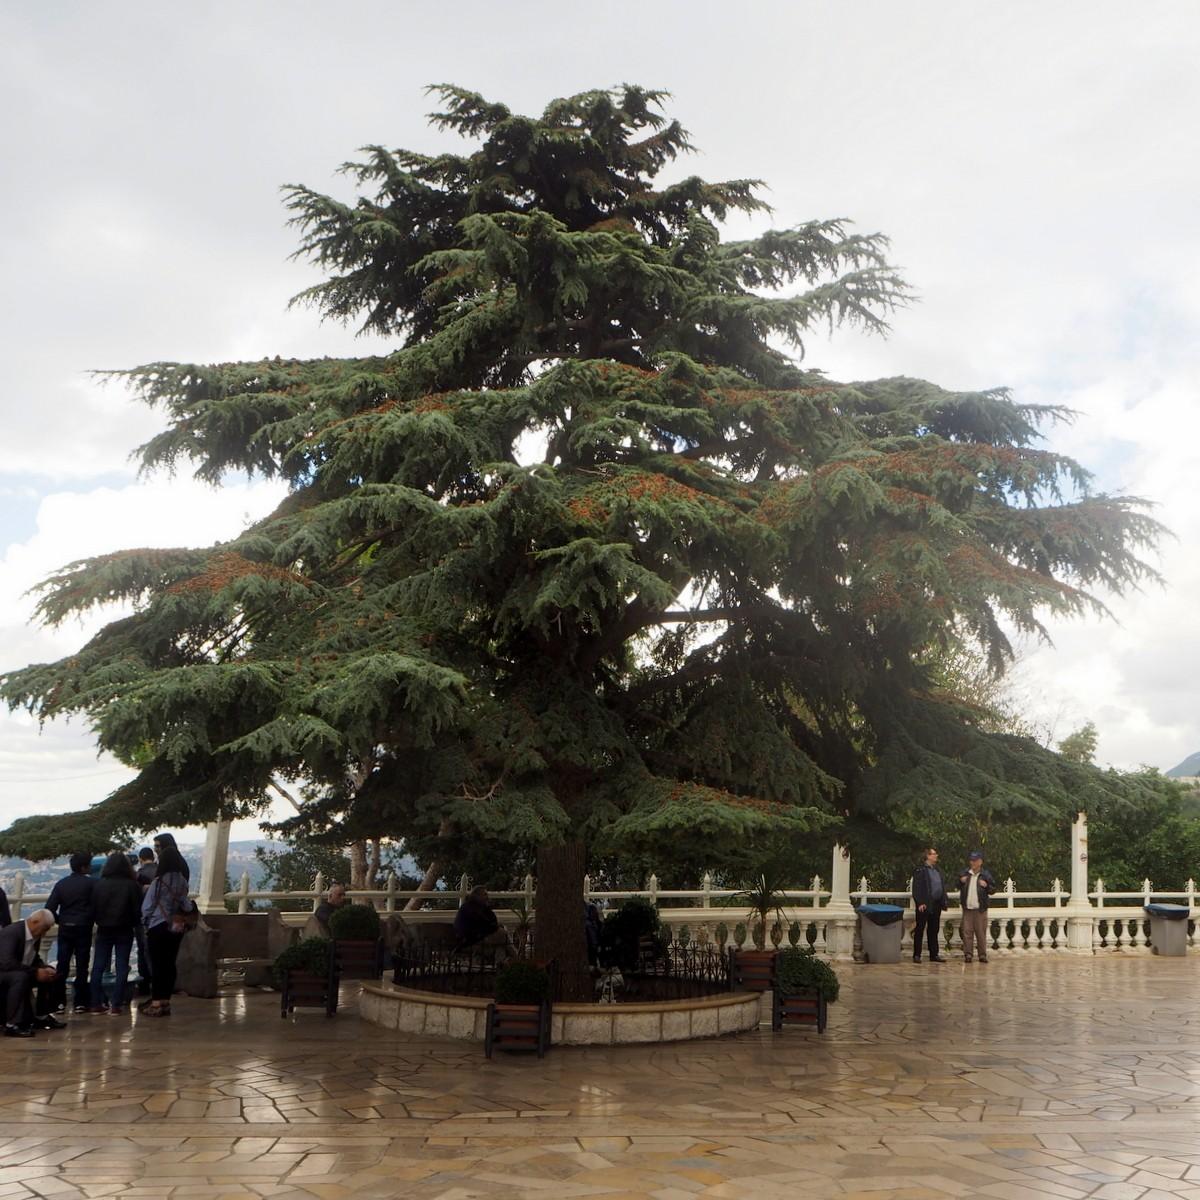 Libanonin seetri Harissa